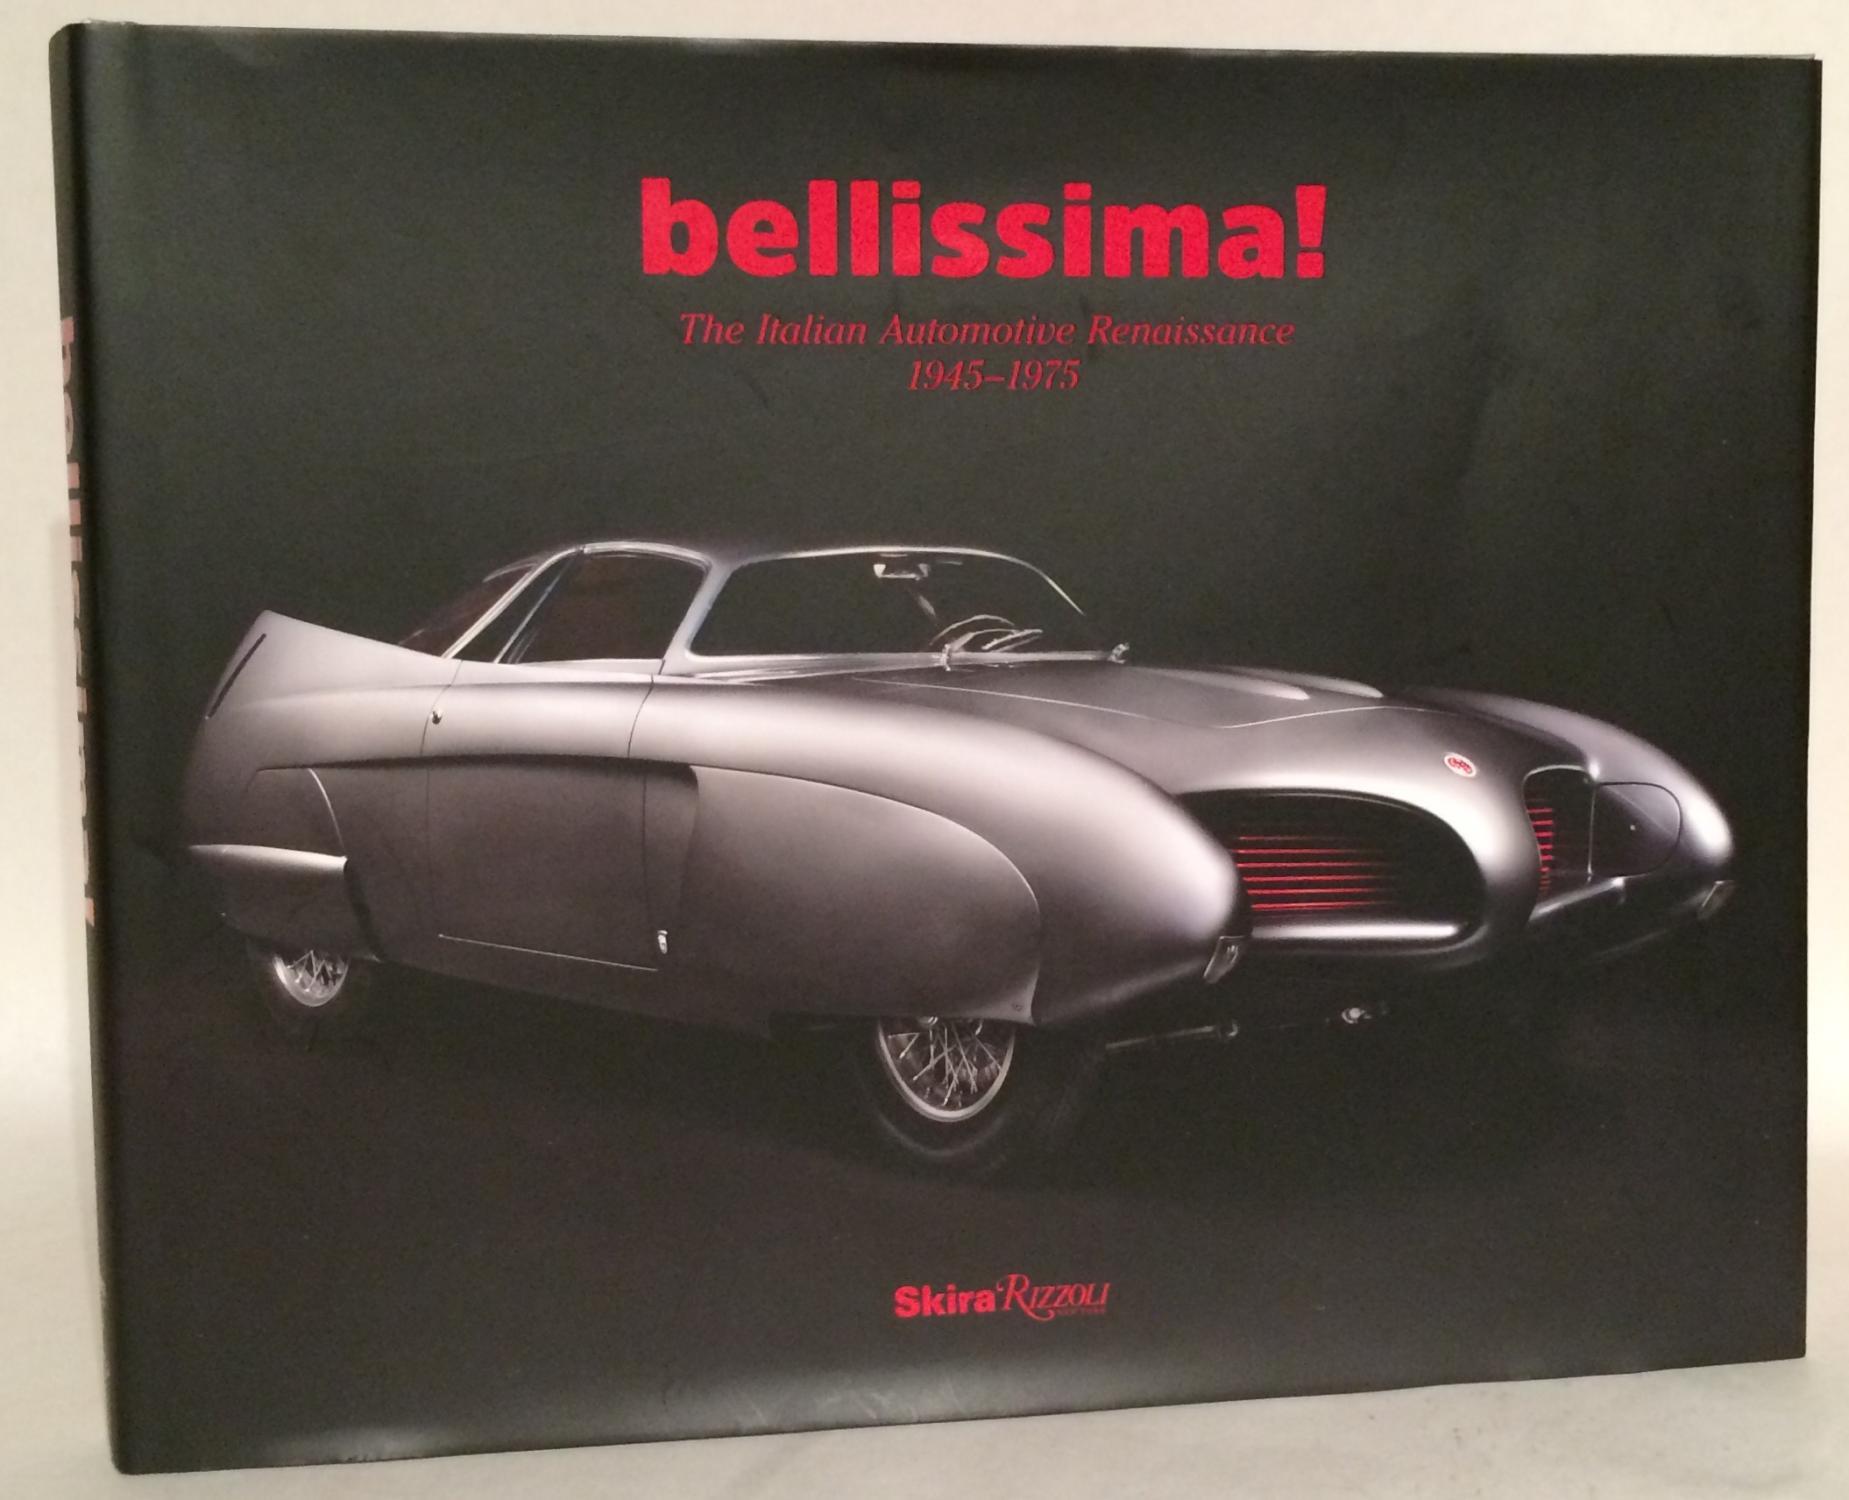 Bellissimo_The_Italian_Automotive_Renaissance_19451975_Gross_Ken_Robert_Cumberford_Winston_Goodfellow_Comme_Neuf_Couverture_rigide